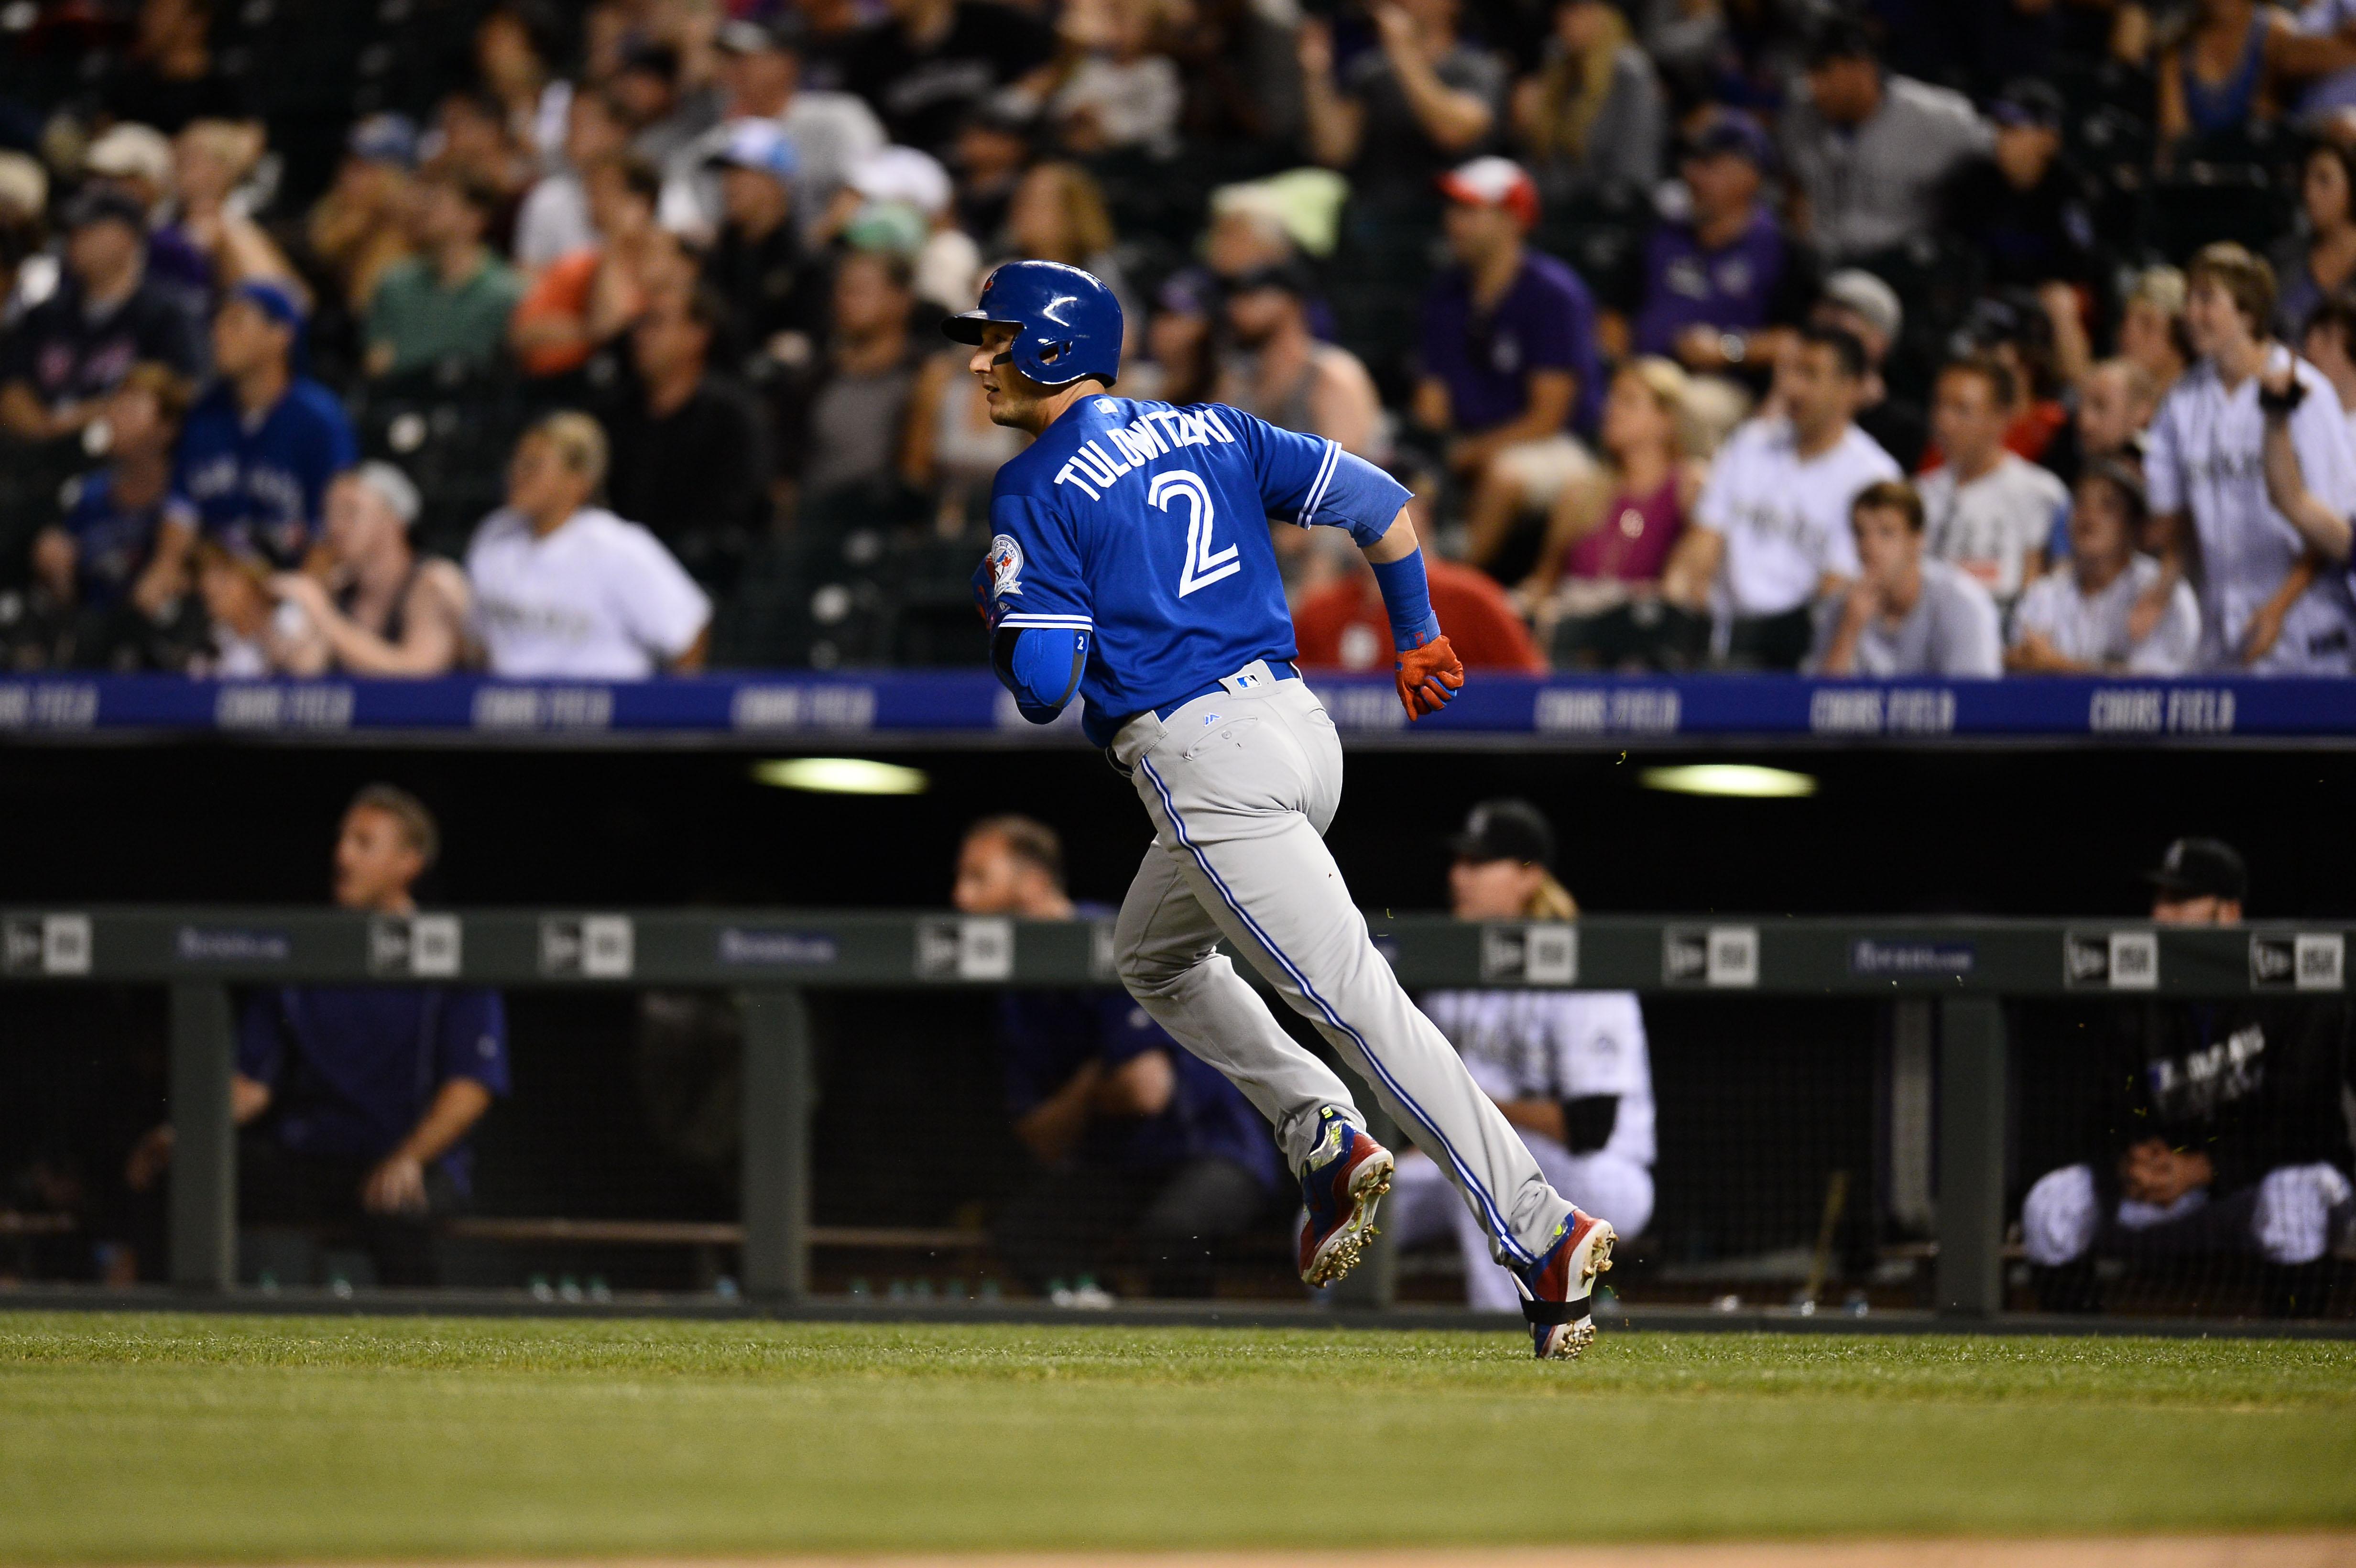 MLB: Toronto Blue Jays at Colorado Rockies